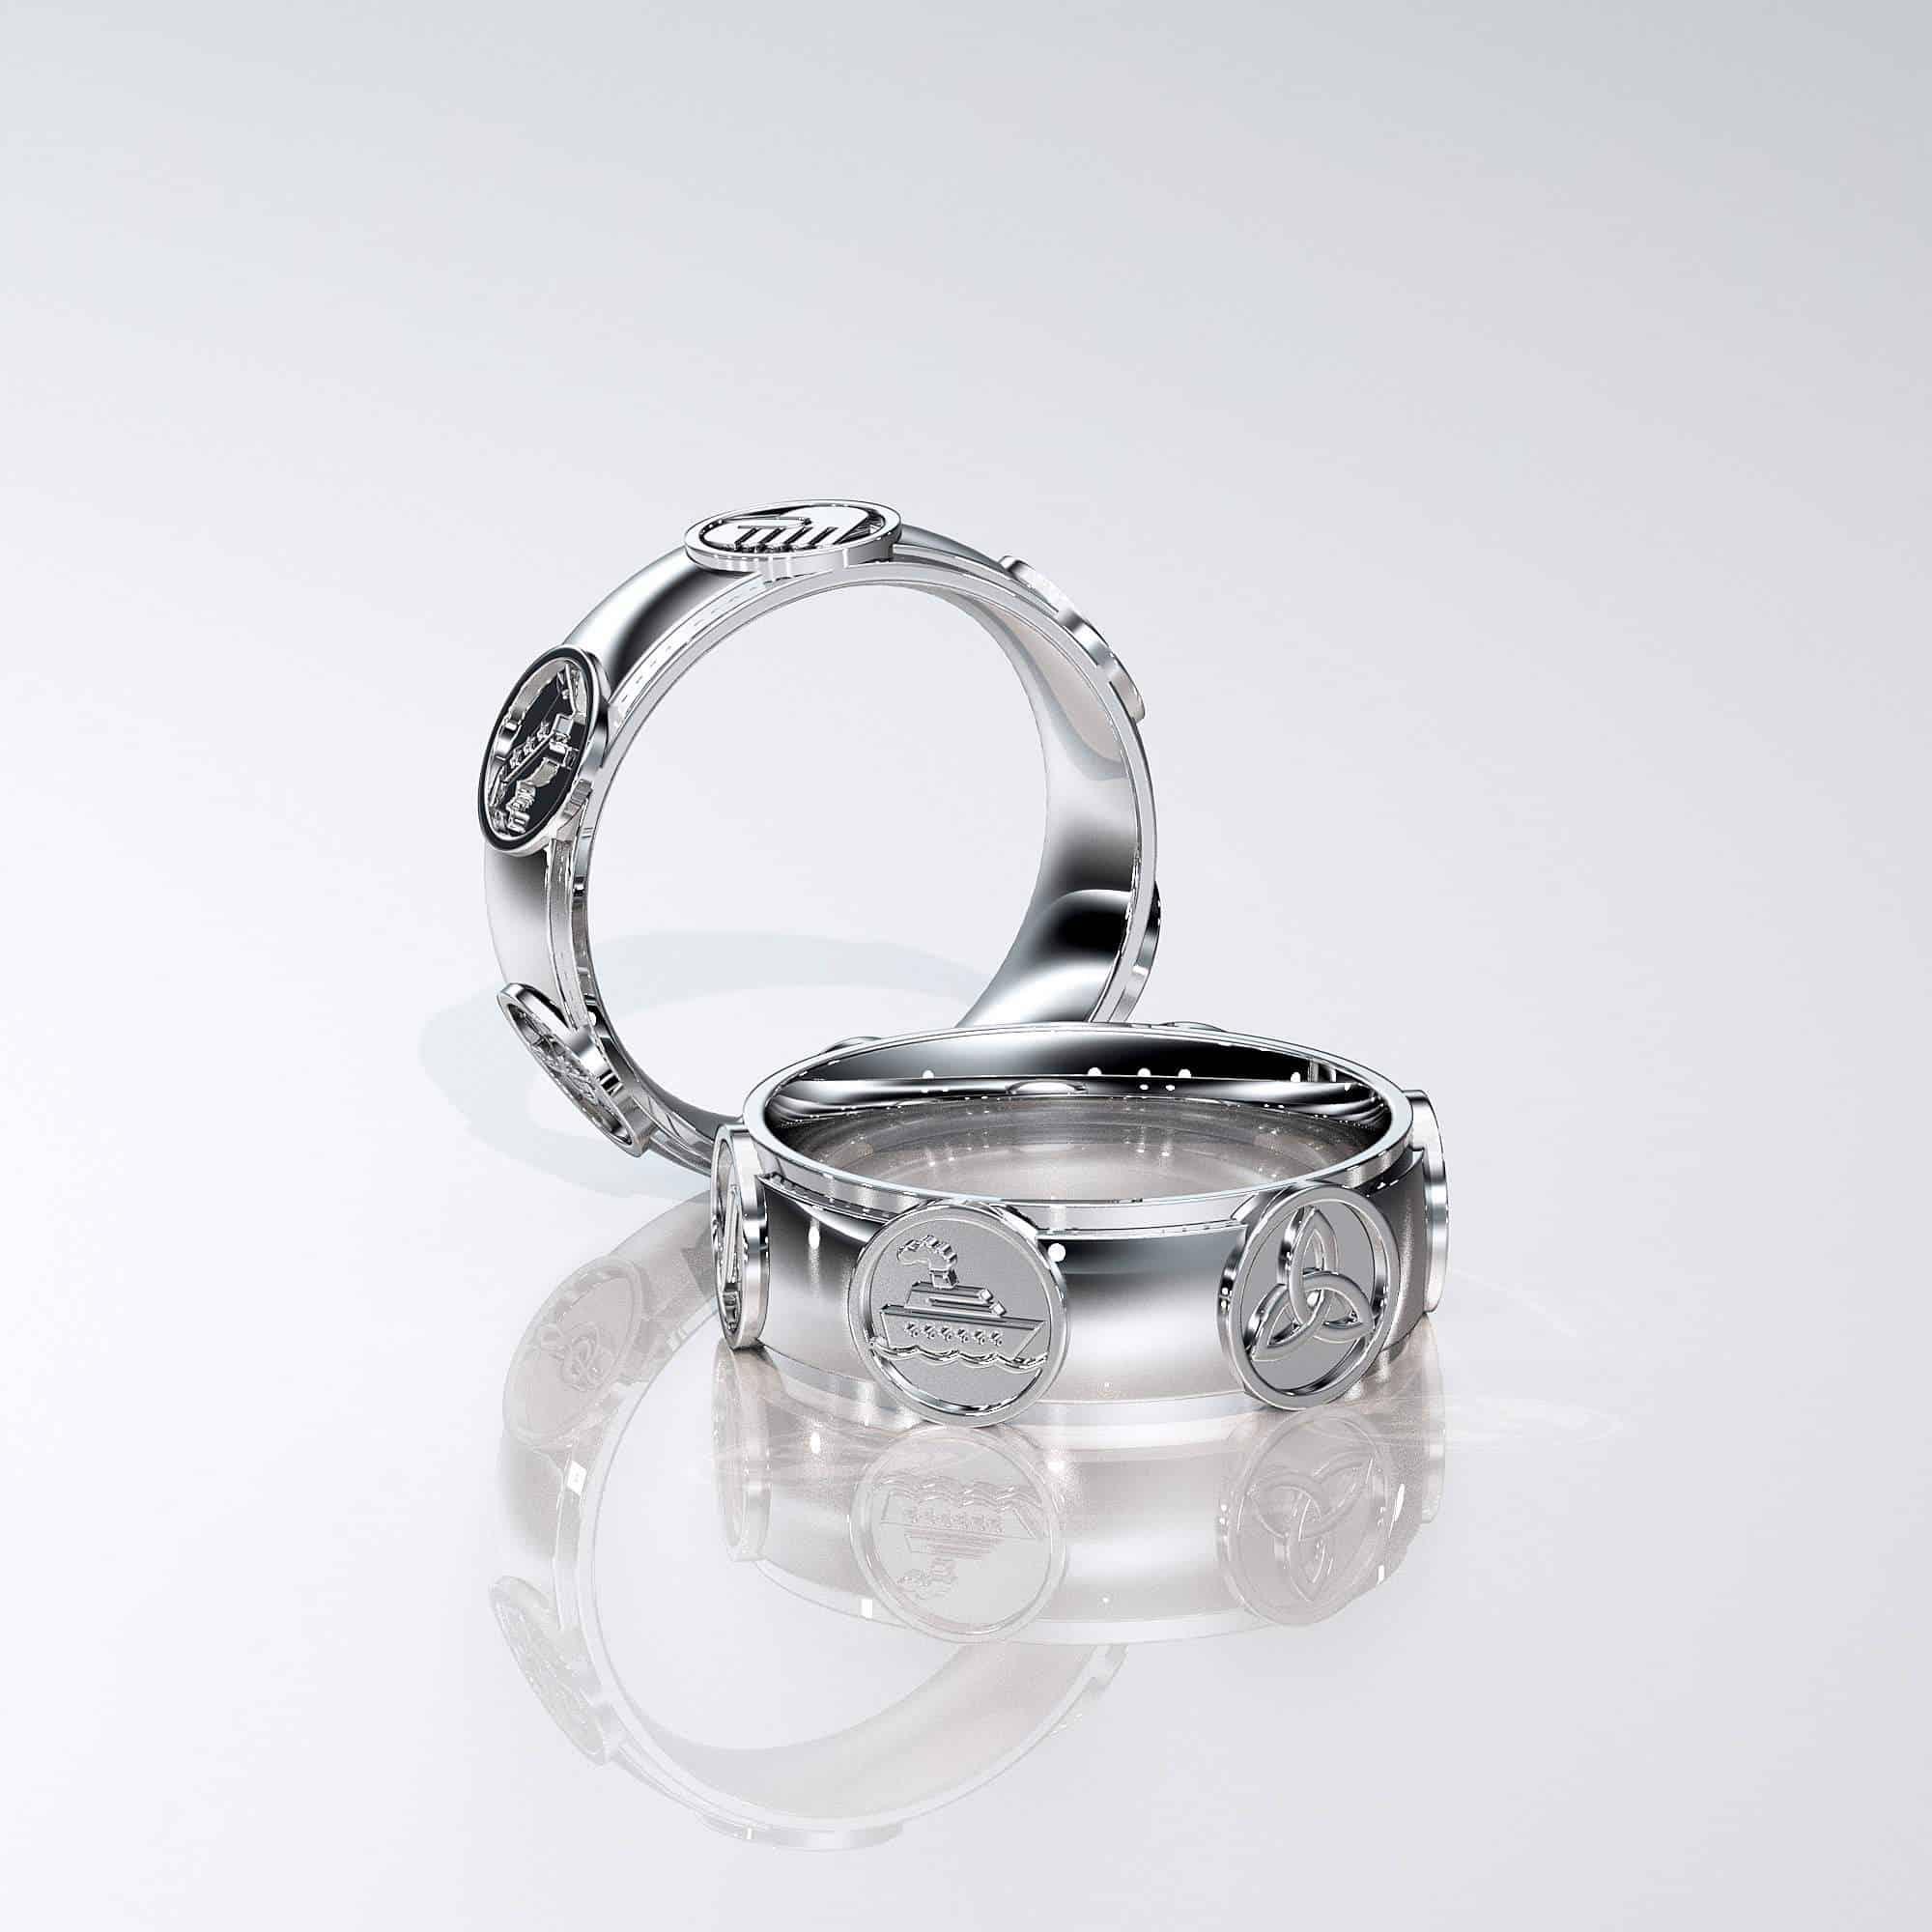 14Karat white Gold ring with 5 symbols on it